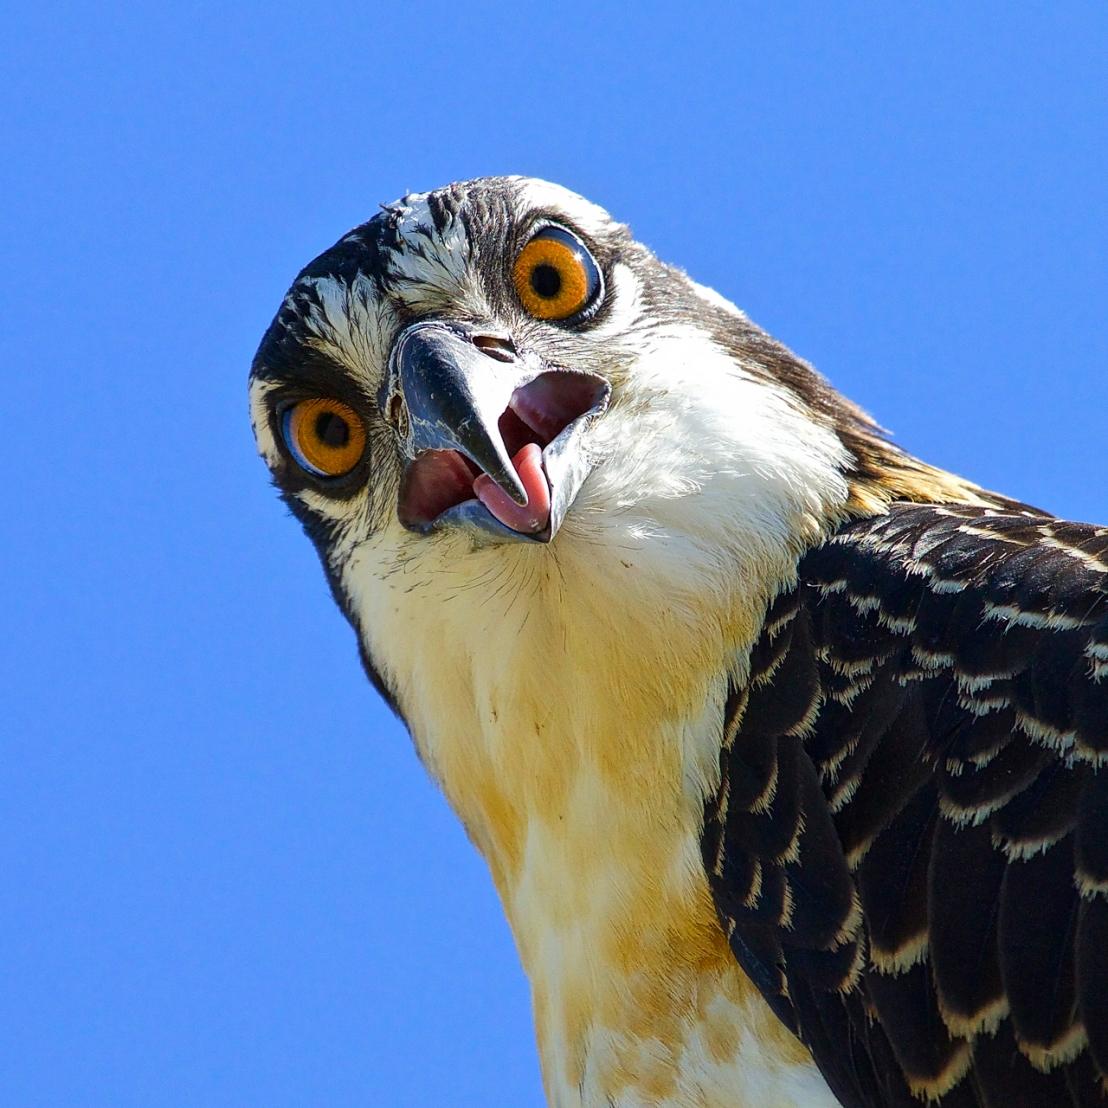 osprey-closeup-07a